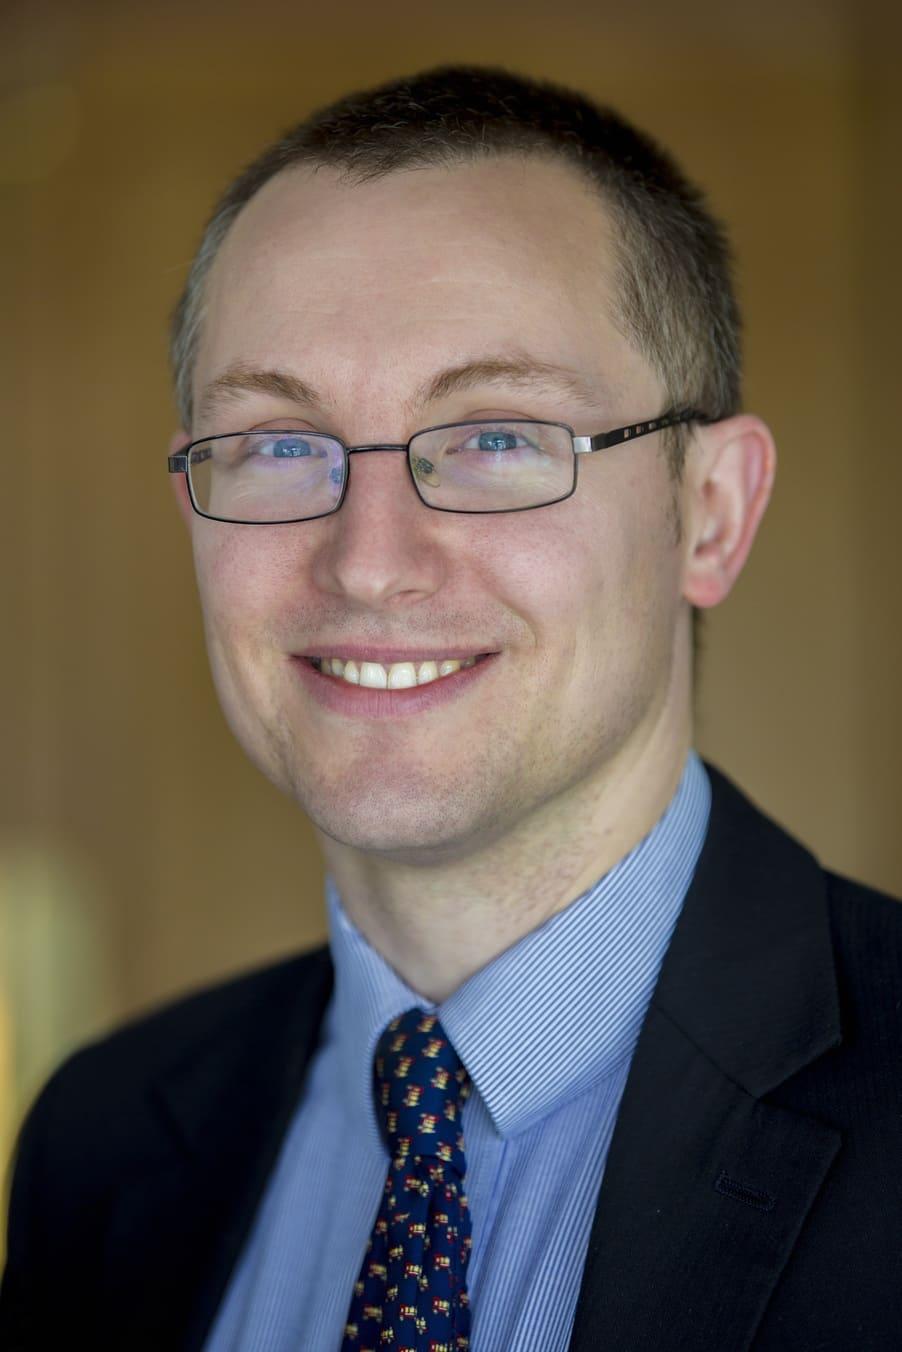 James Chalmers - profile image